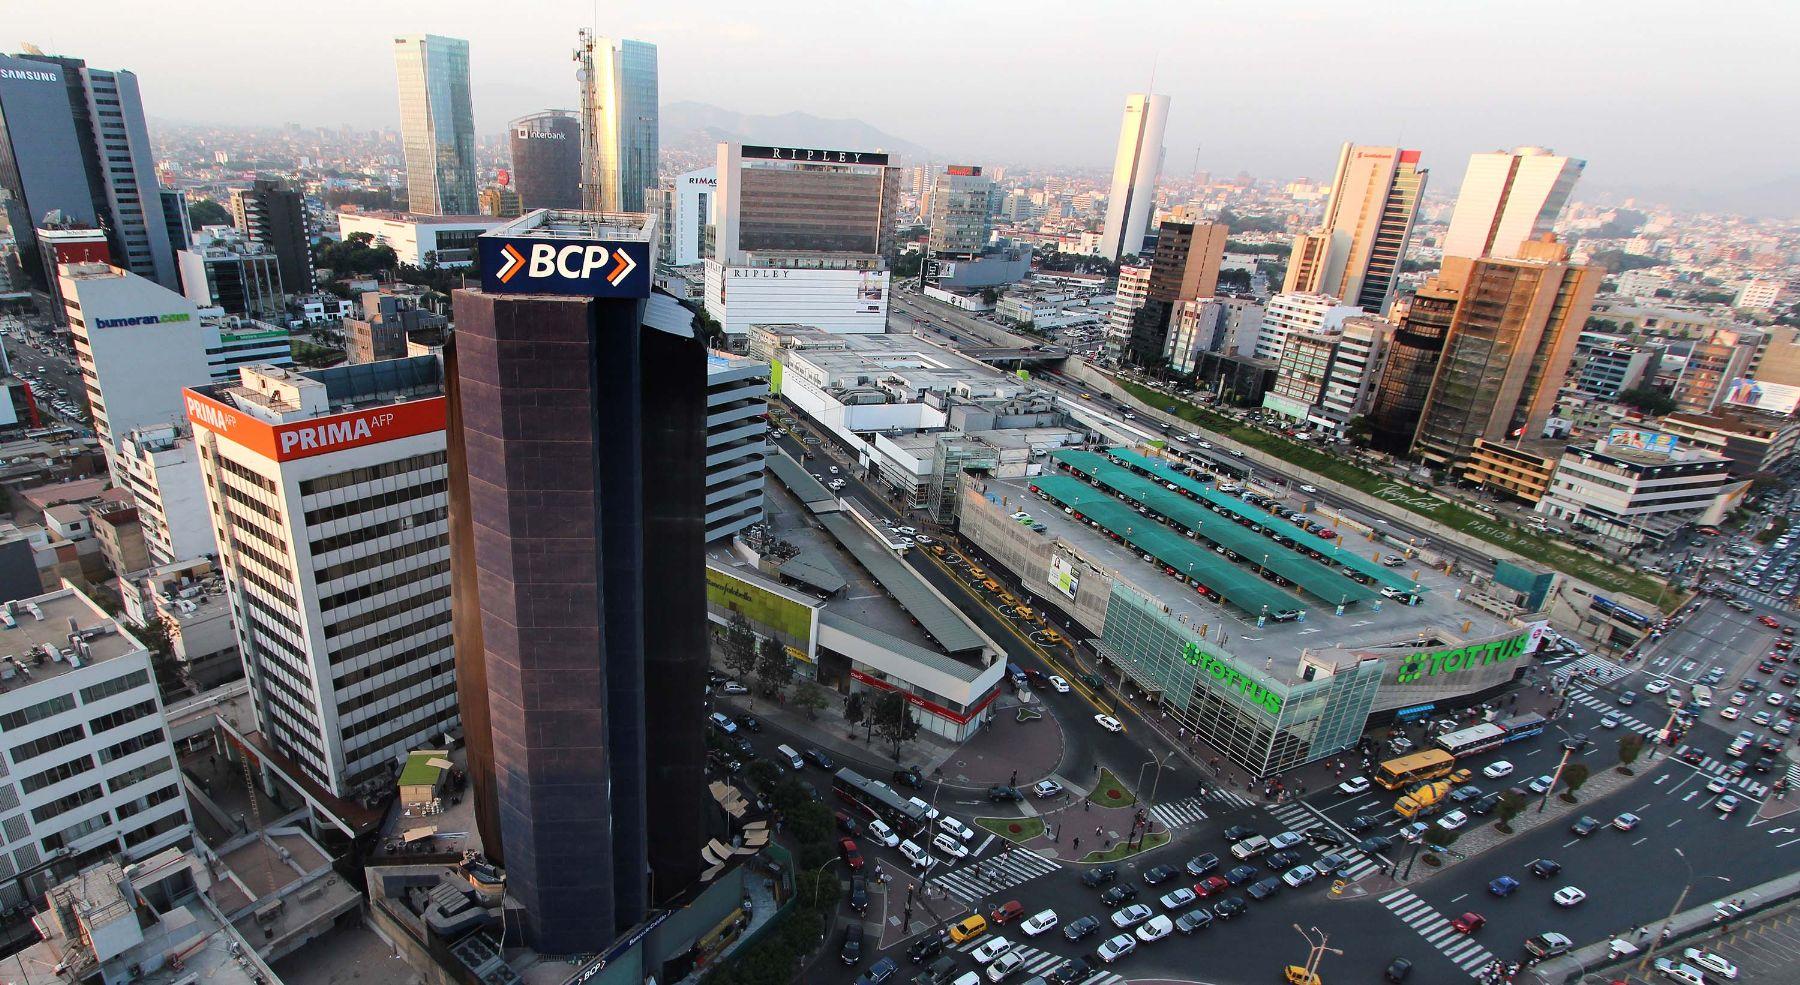 centro financiero, Lima Perú.Foto: Archivo